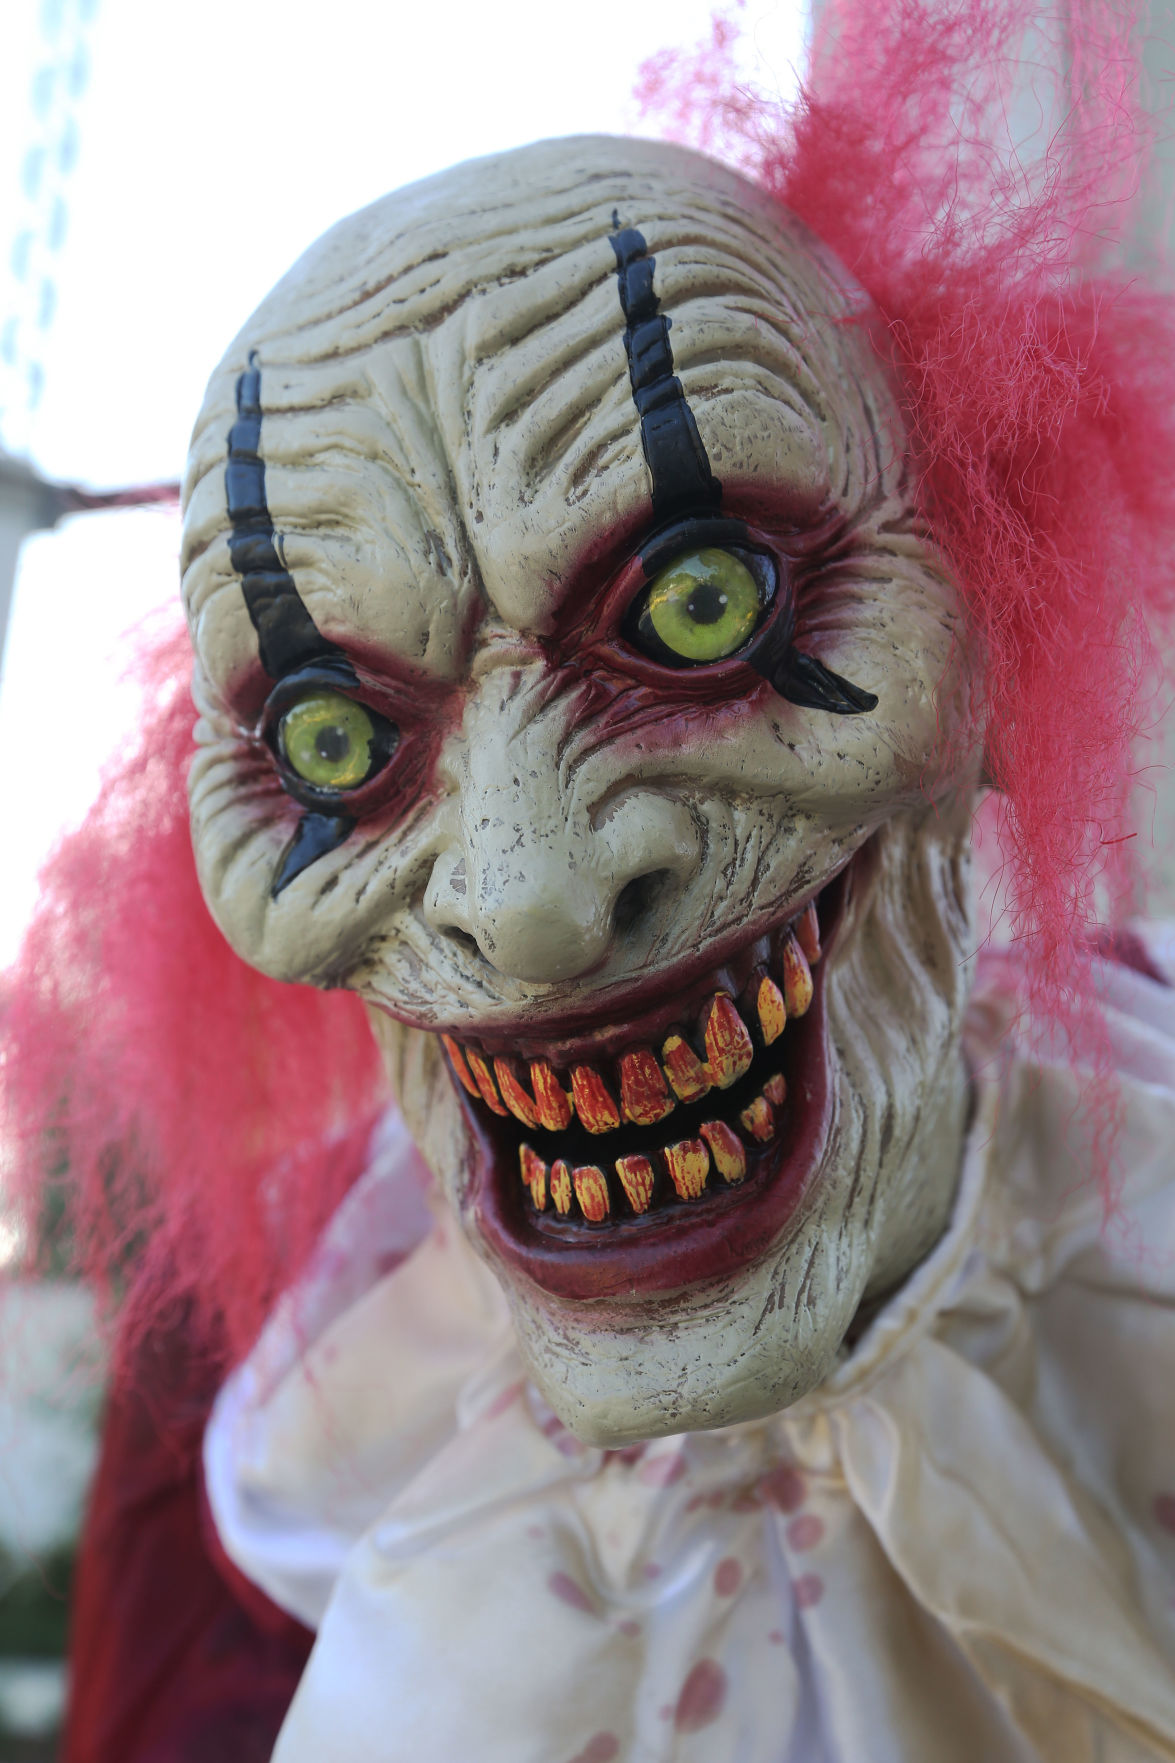 Scare Valley clown face